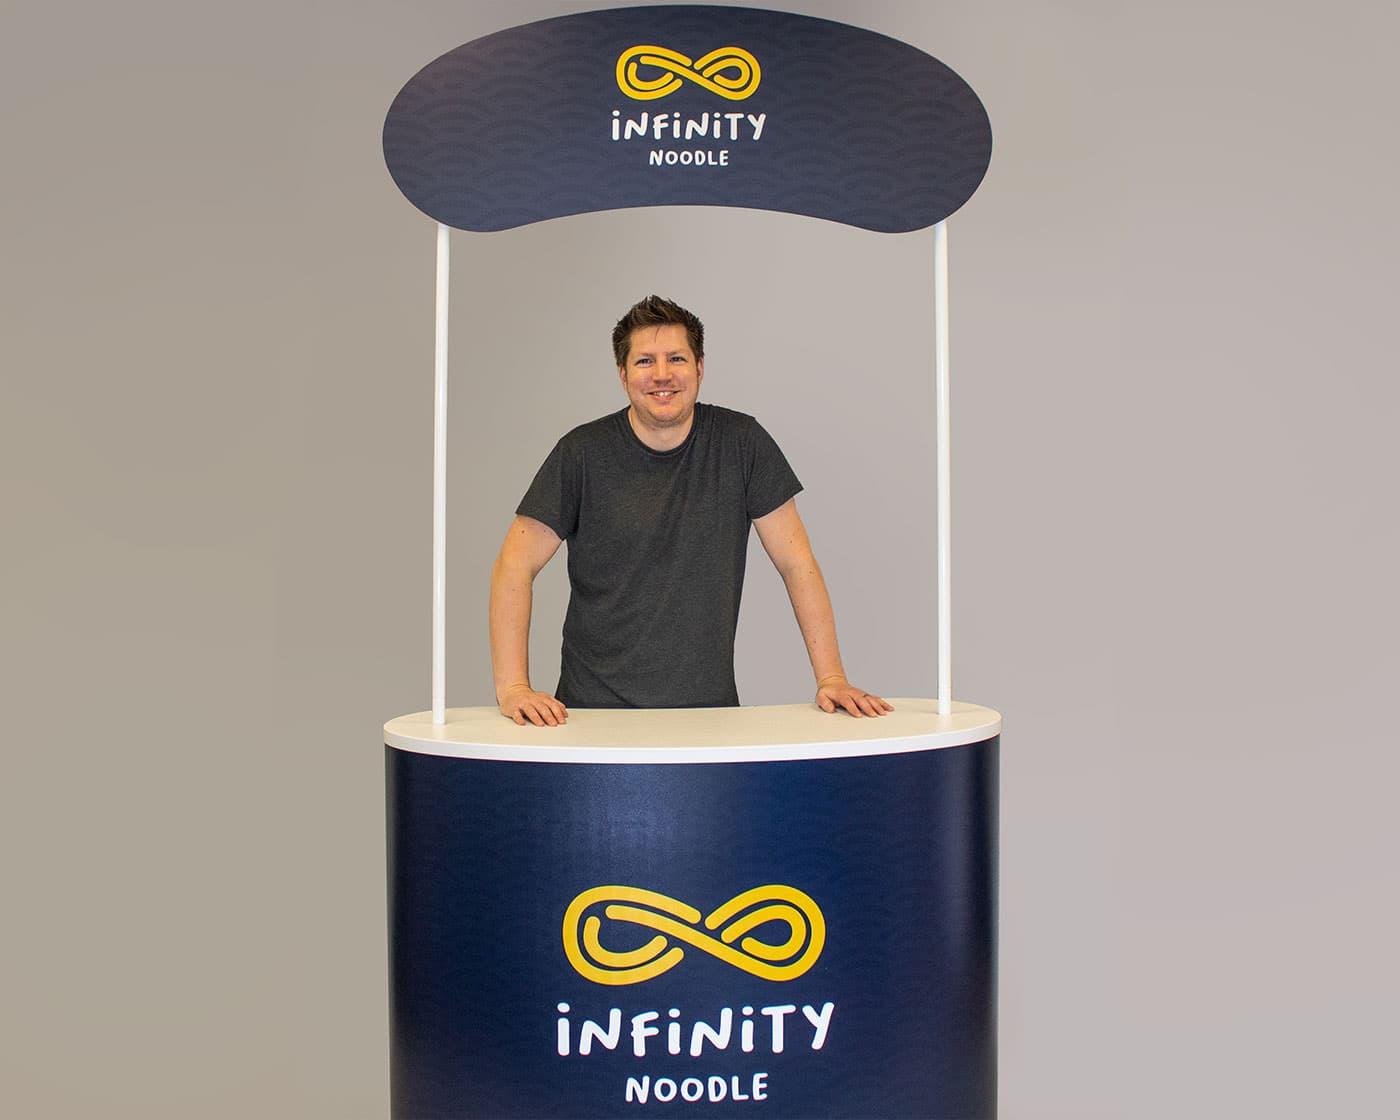 Infinity-Noodle-1